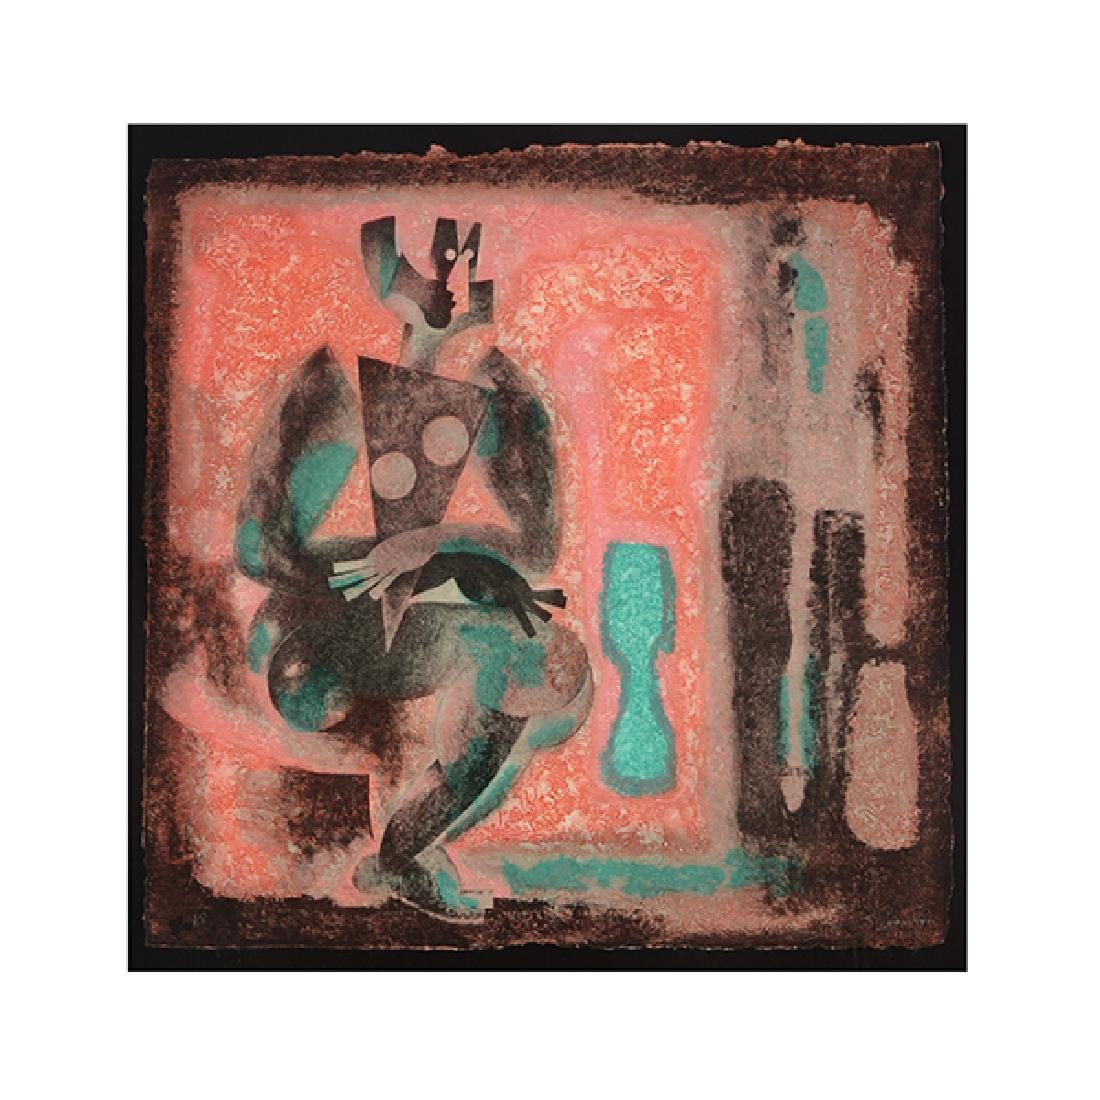 "Byron Galvez ""Uno Paso"" acrylicograph on paper"